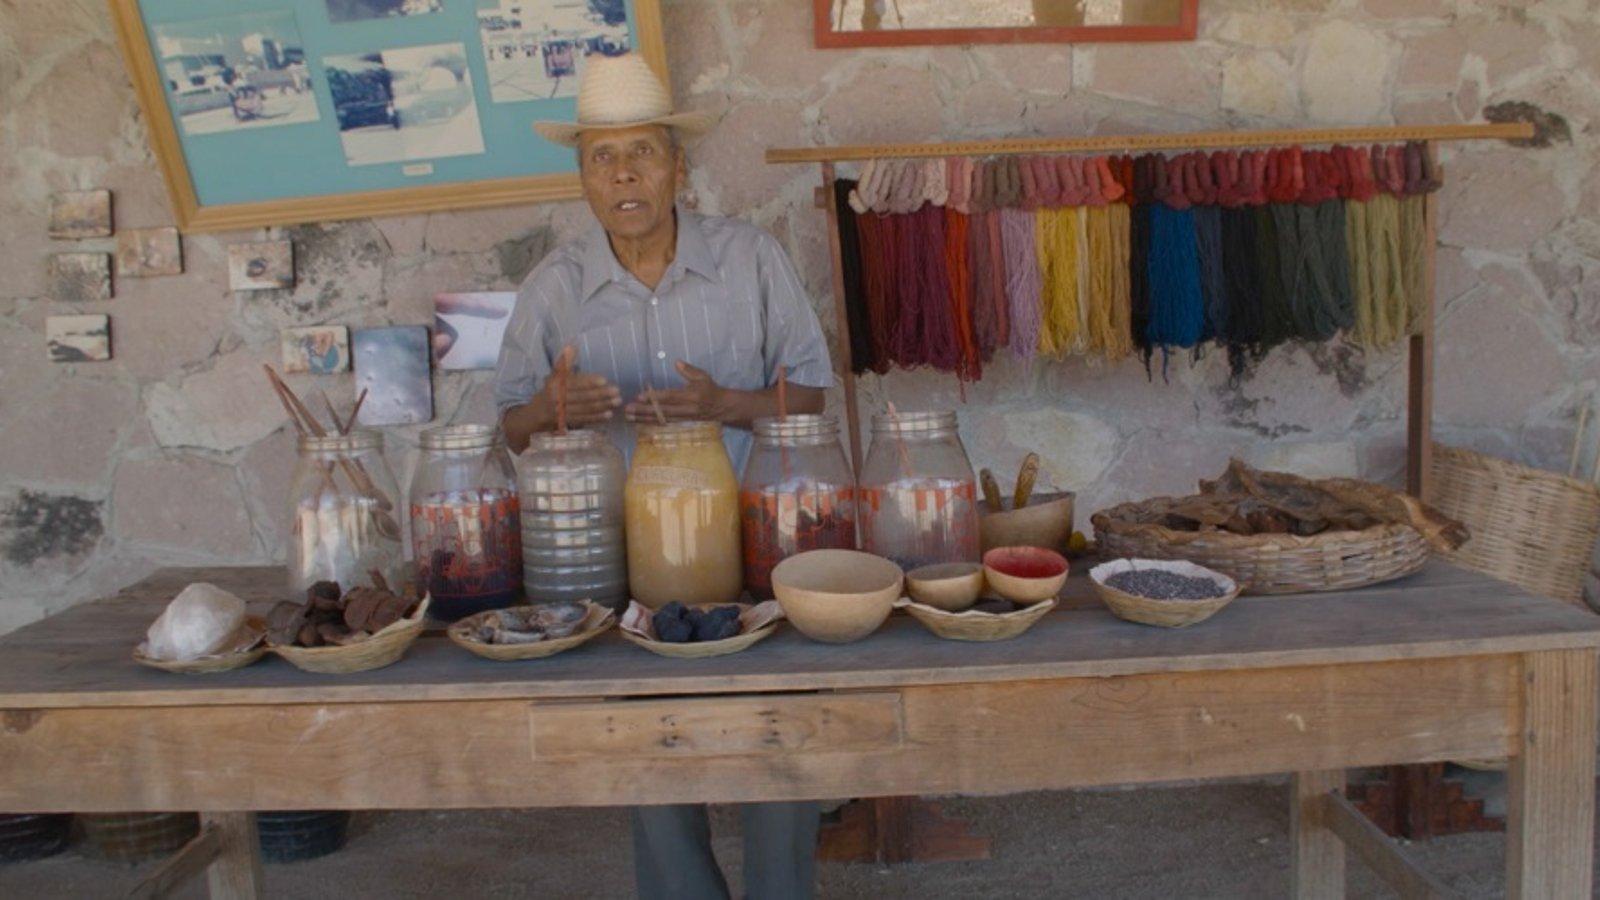 The Zapotec Way - Dyeing and Weaving at La Grana Tejidos